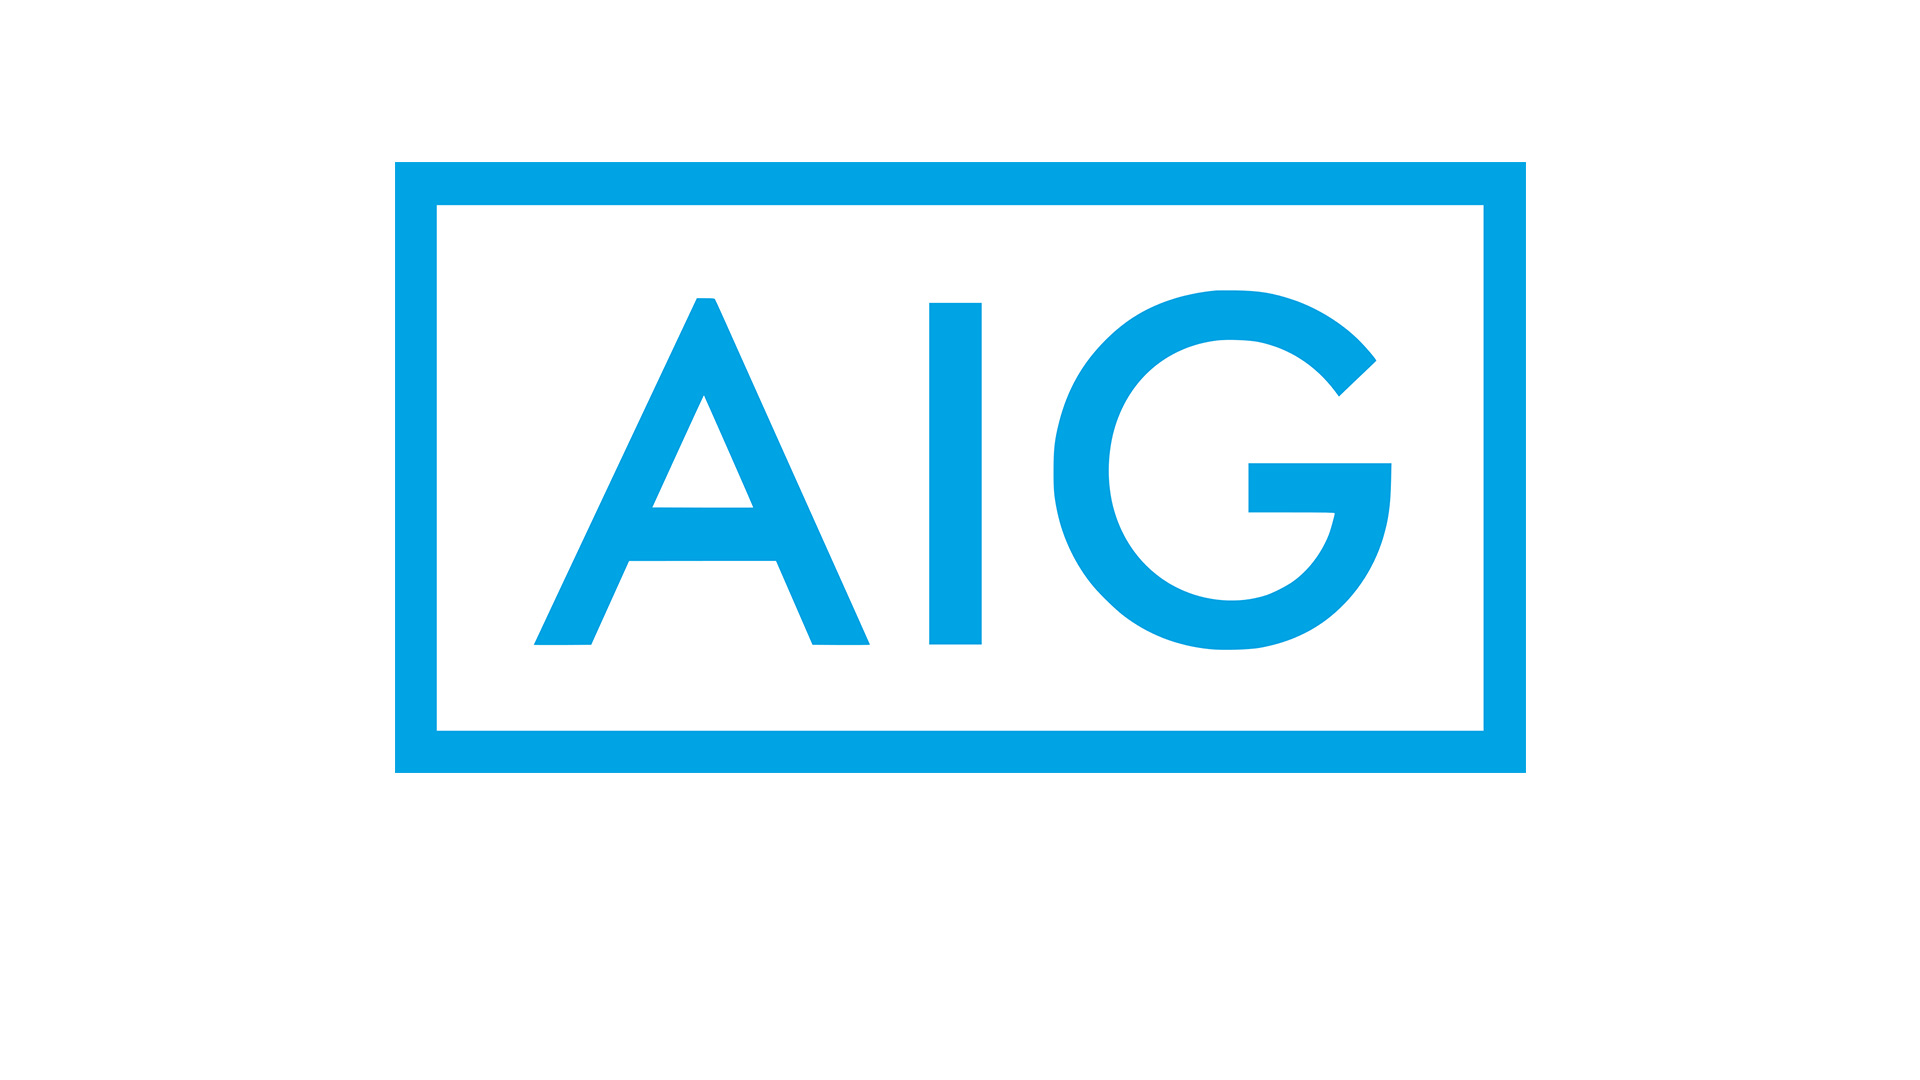 AIG Logo wallpaper 2018 in Brands Logos 1920x1080